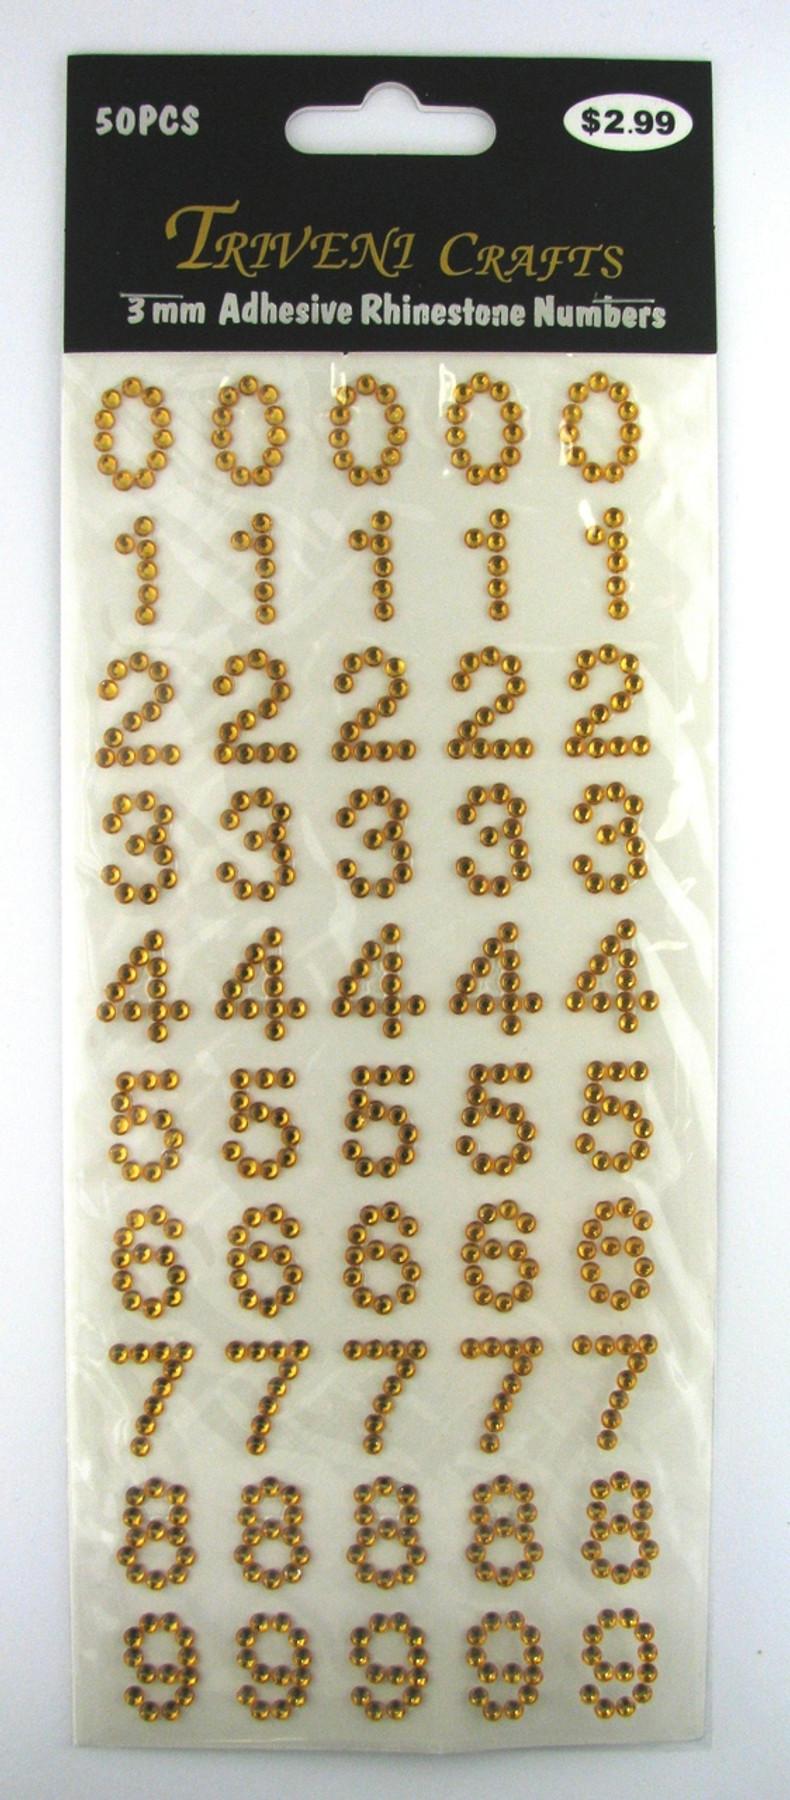 16mm Topaz Numbers Flatback Rhinestones (50 pcs) Self-Adhesive - Easy Peel Strips